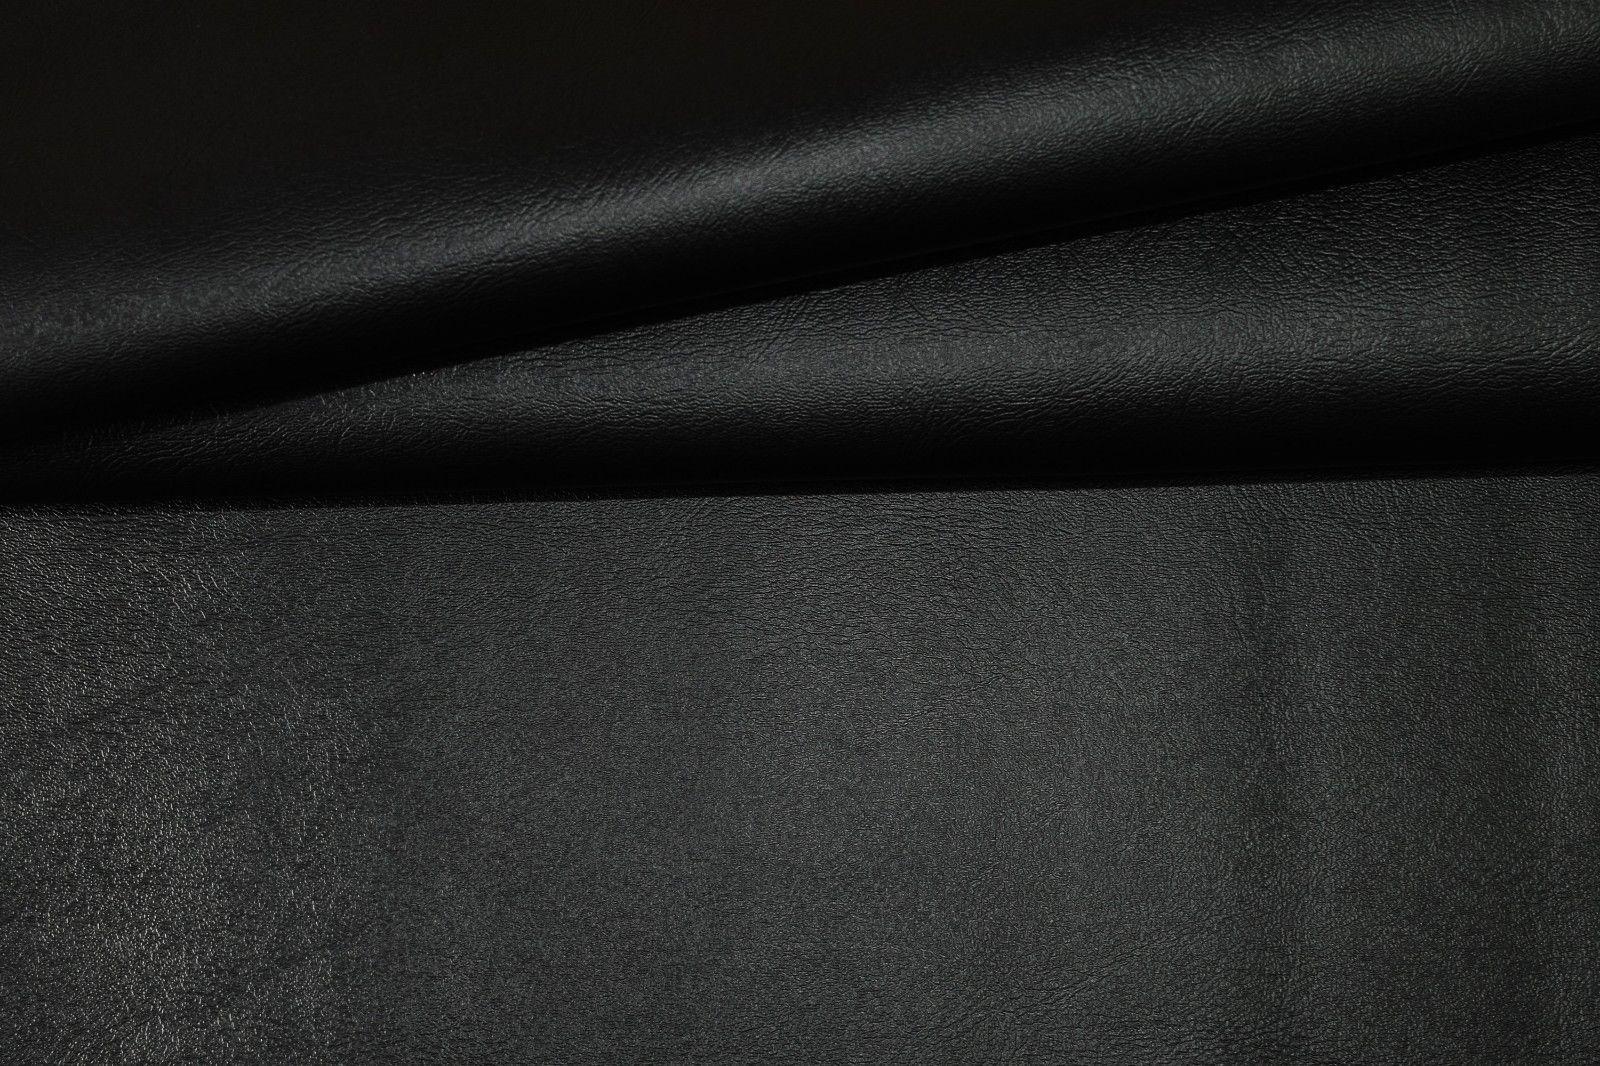 fabric crafts. Black Bedroom Furniture Sets. Home Design Ideas